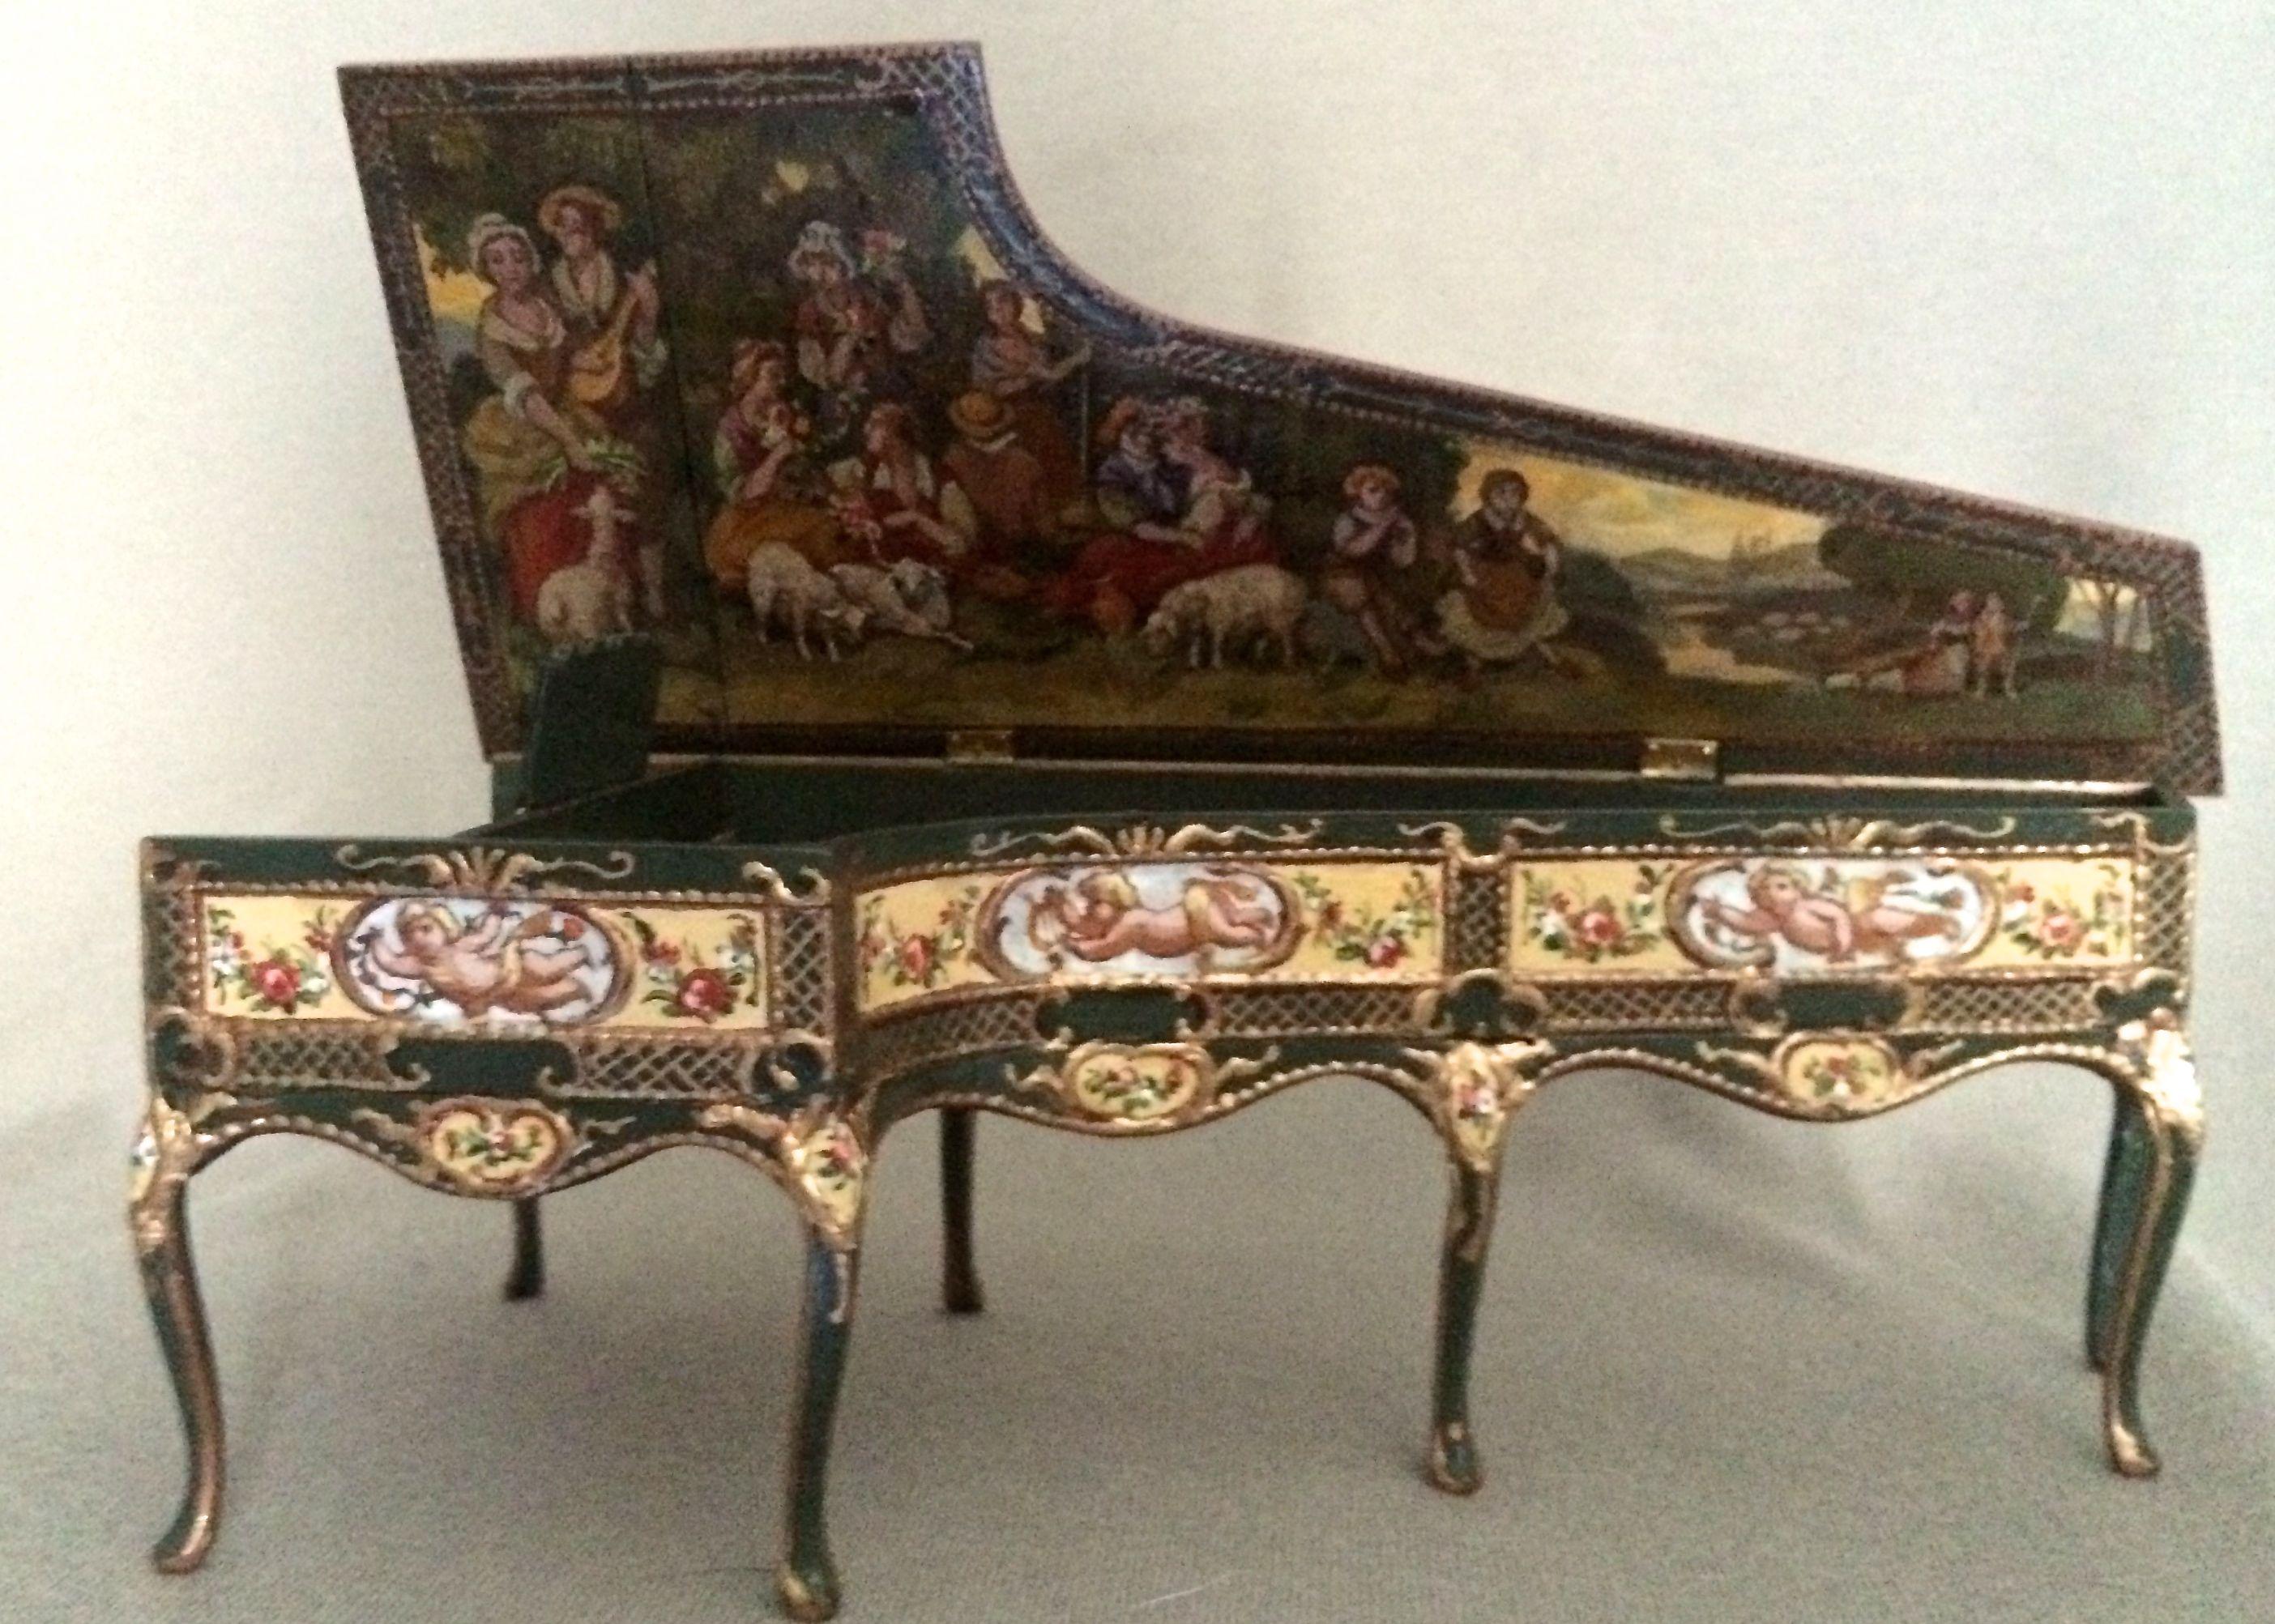 Kuchaski Muebles - Pastoral Harpsichord Miniature Musical Instruments Pinterest [mjhdah]https://i.pinimg.com/originals/69/7a/25/697a25f151b7aac8b0cad3d28bf1821c.jpg